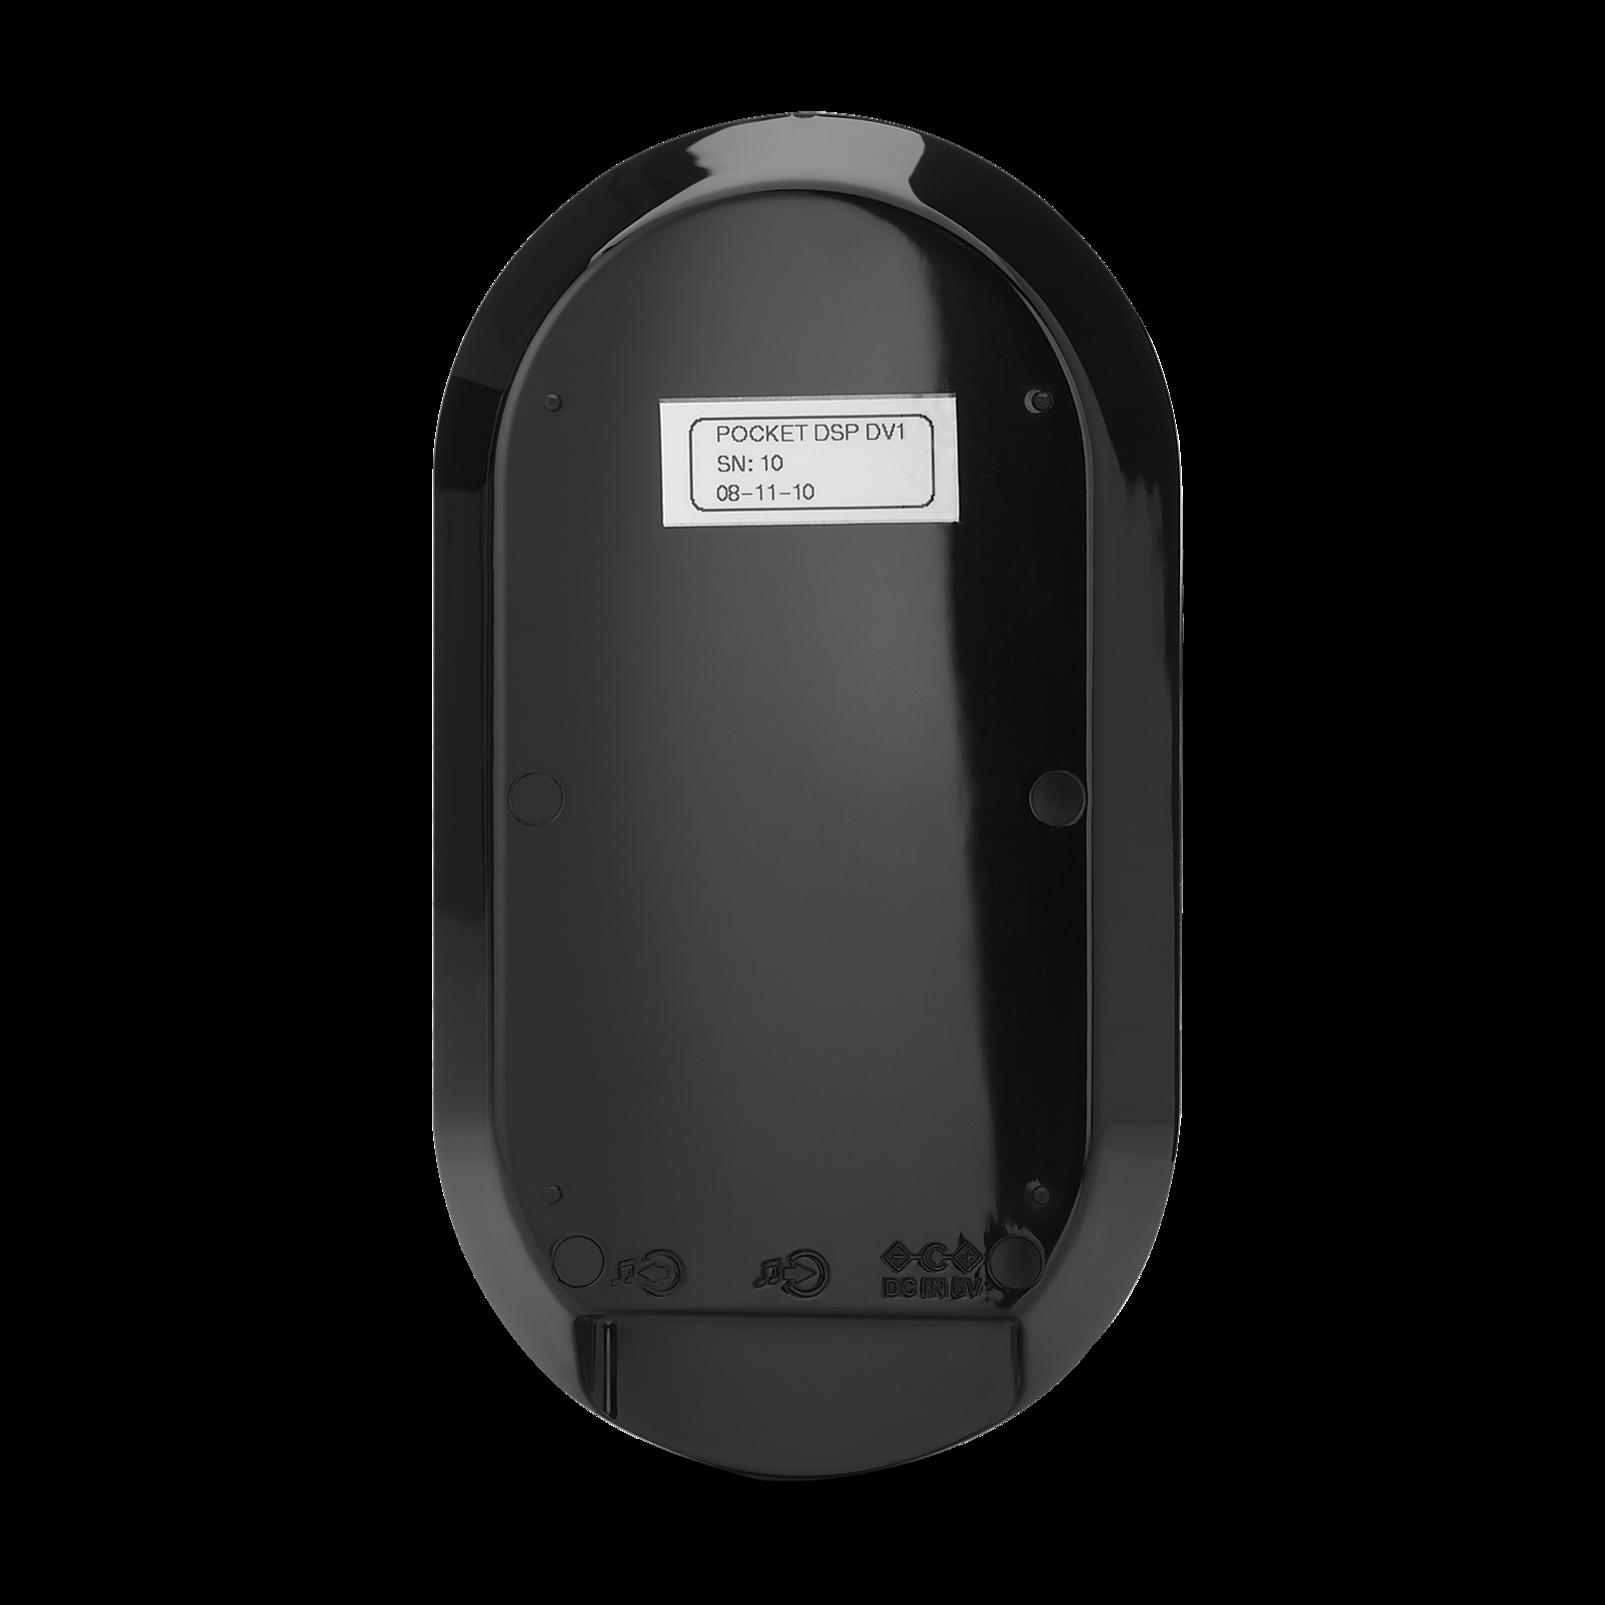 MS-2 Pocket DSP